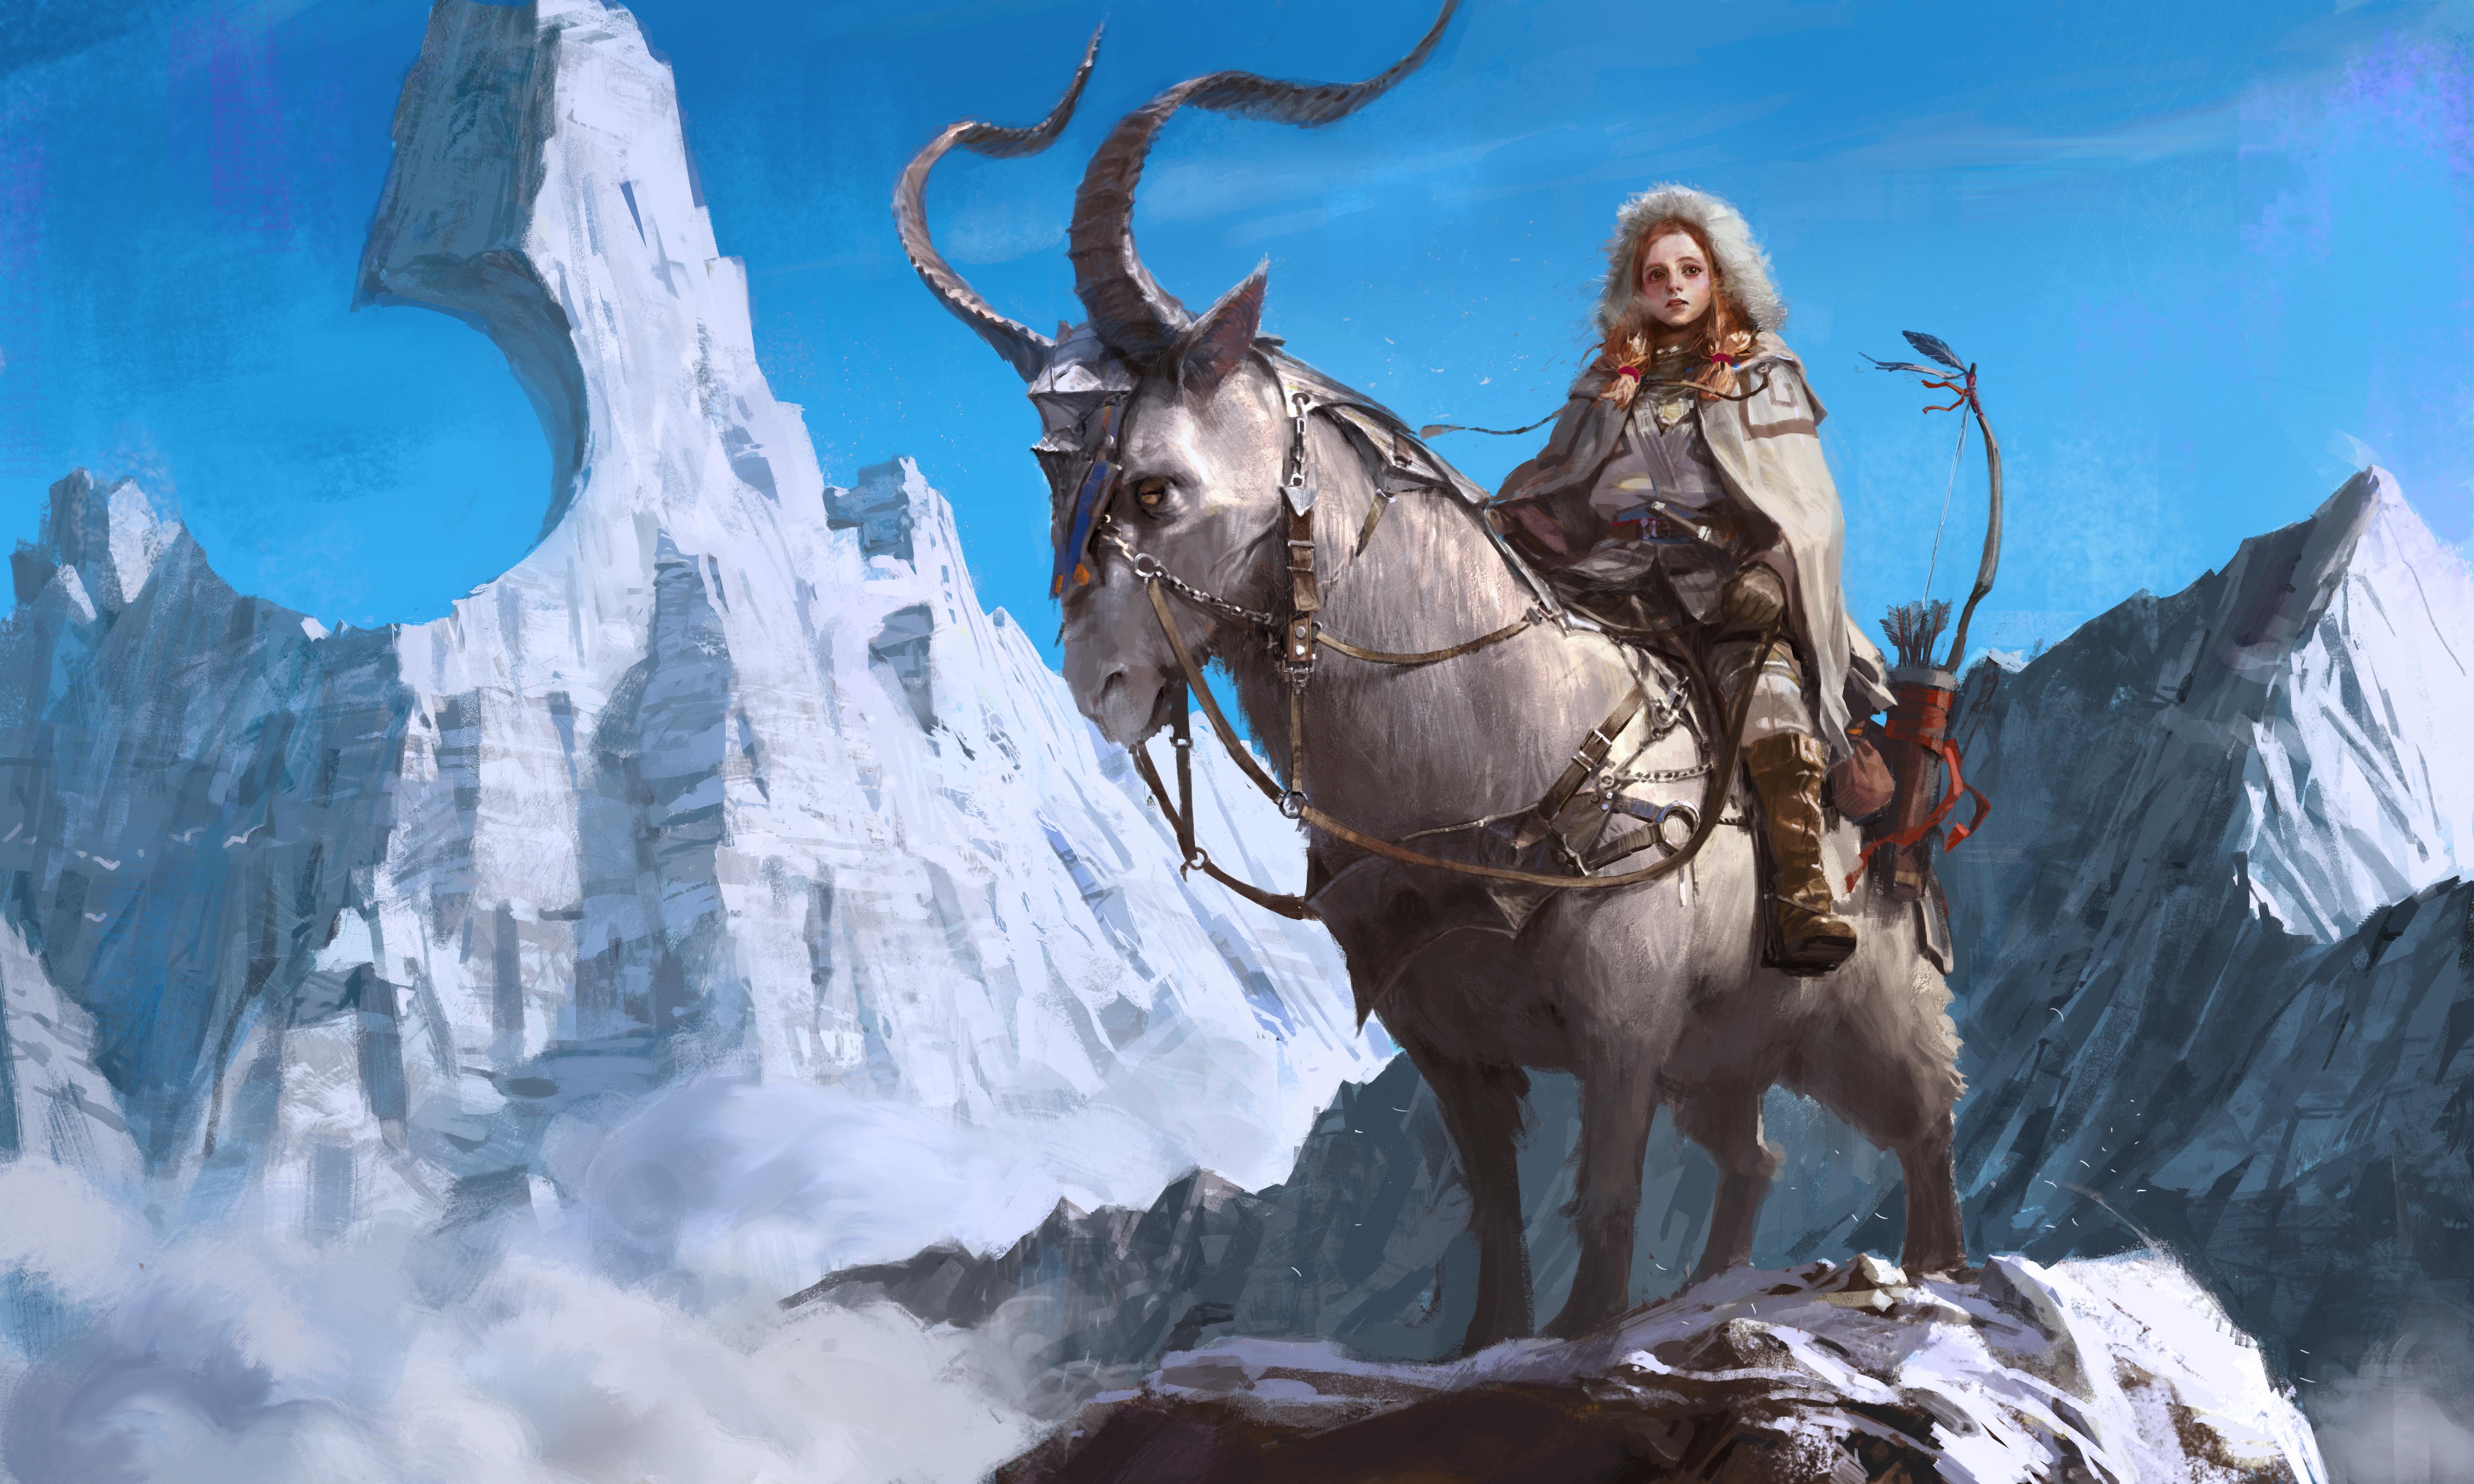 Animal Bow Girl Horns Mountain Redhead Woman Warrior 5000x3000